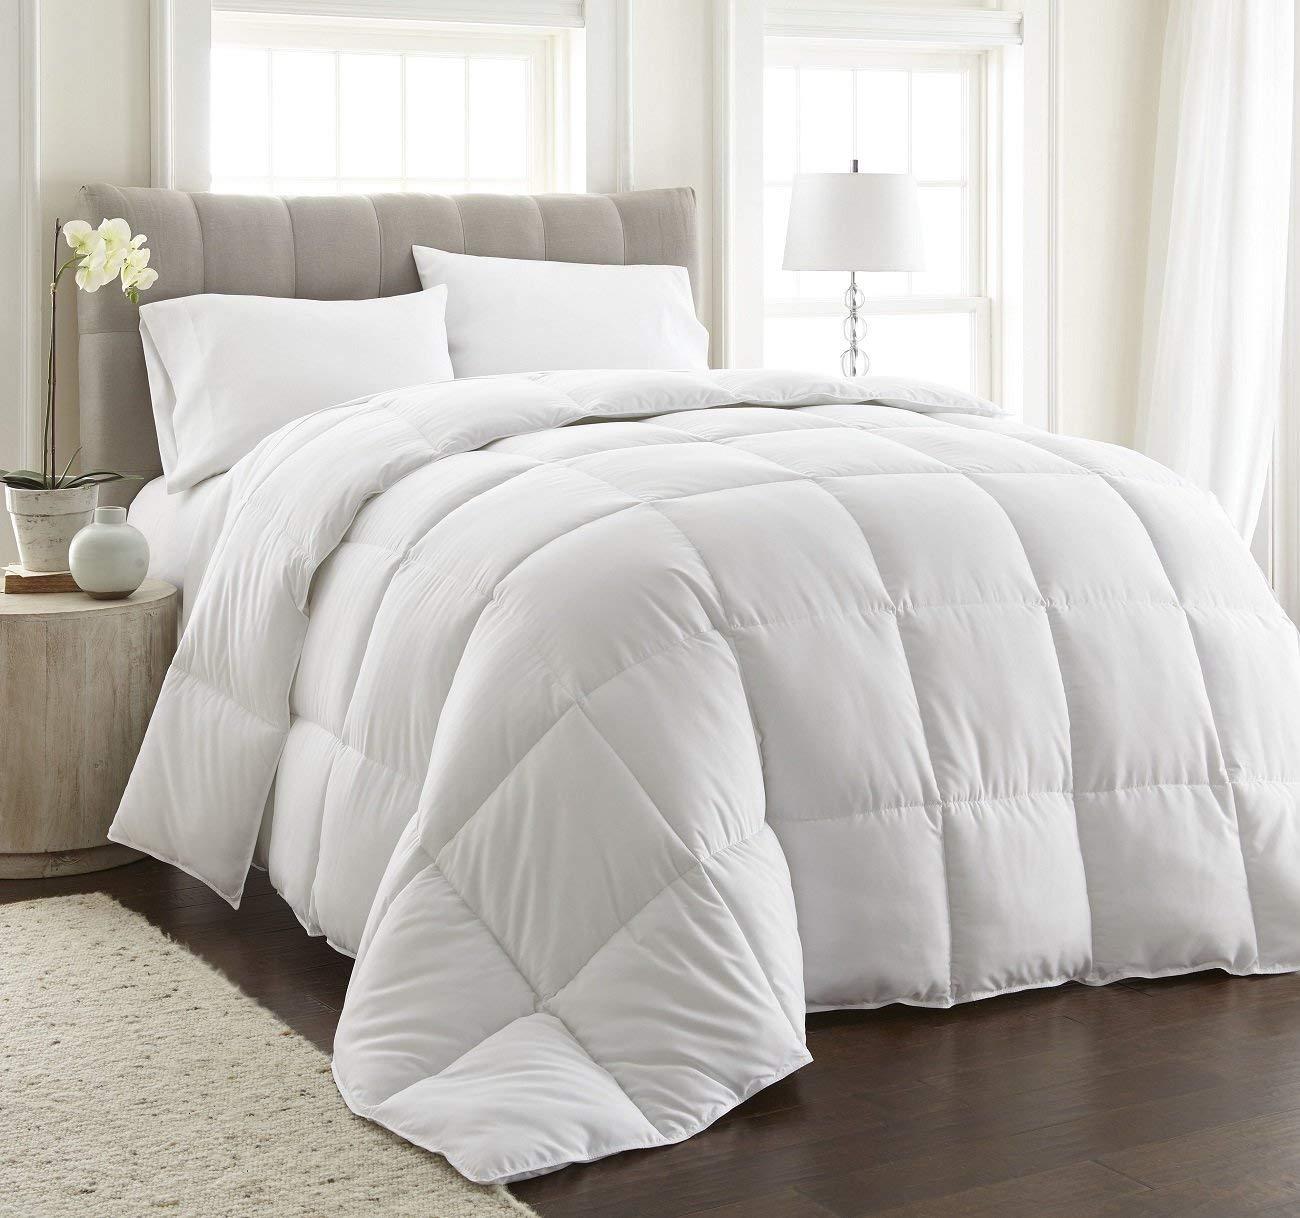 Chezmoi Collection All Season Ultra/Medium/Light Warmth Down Alternative Comforter